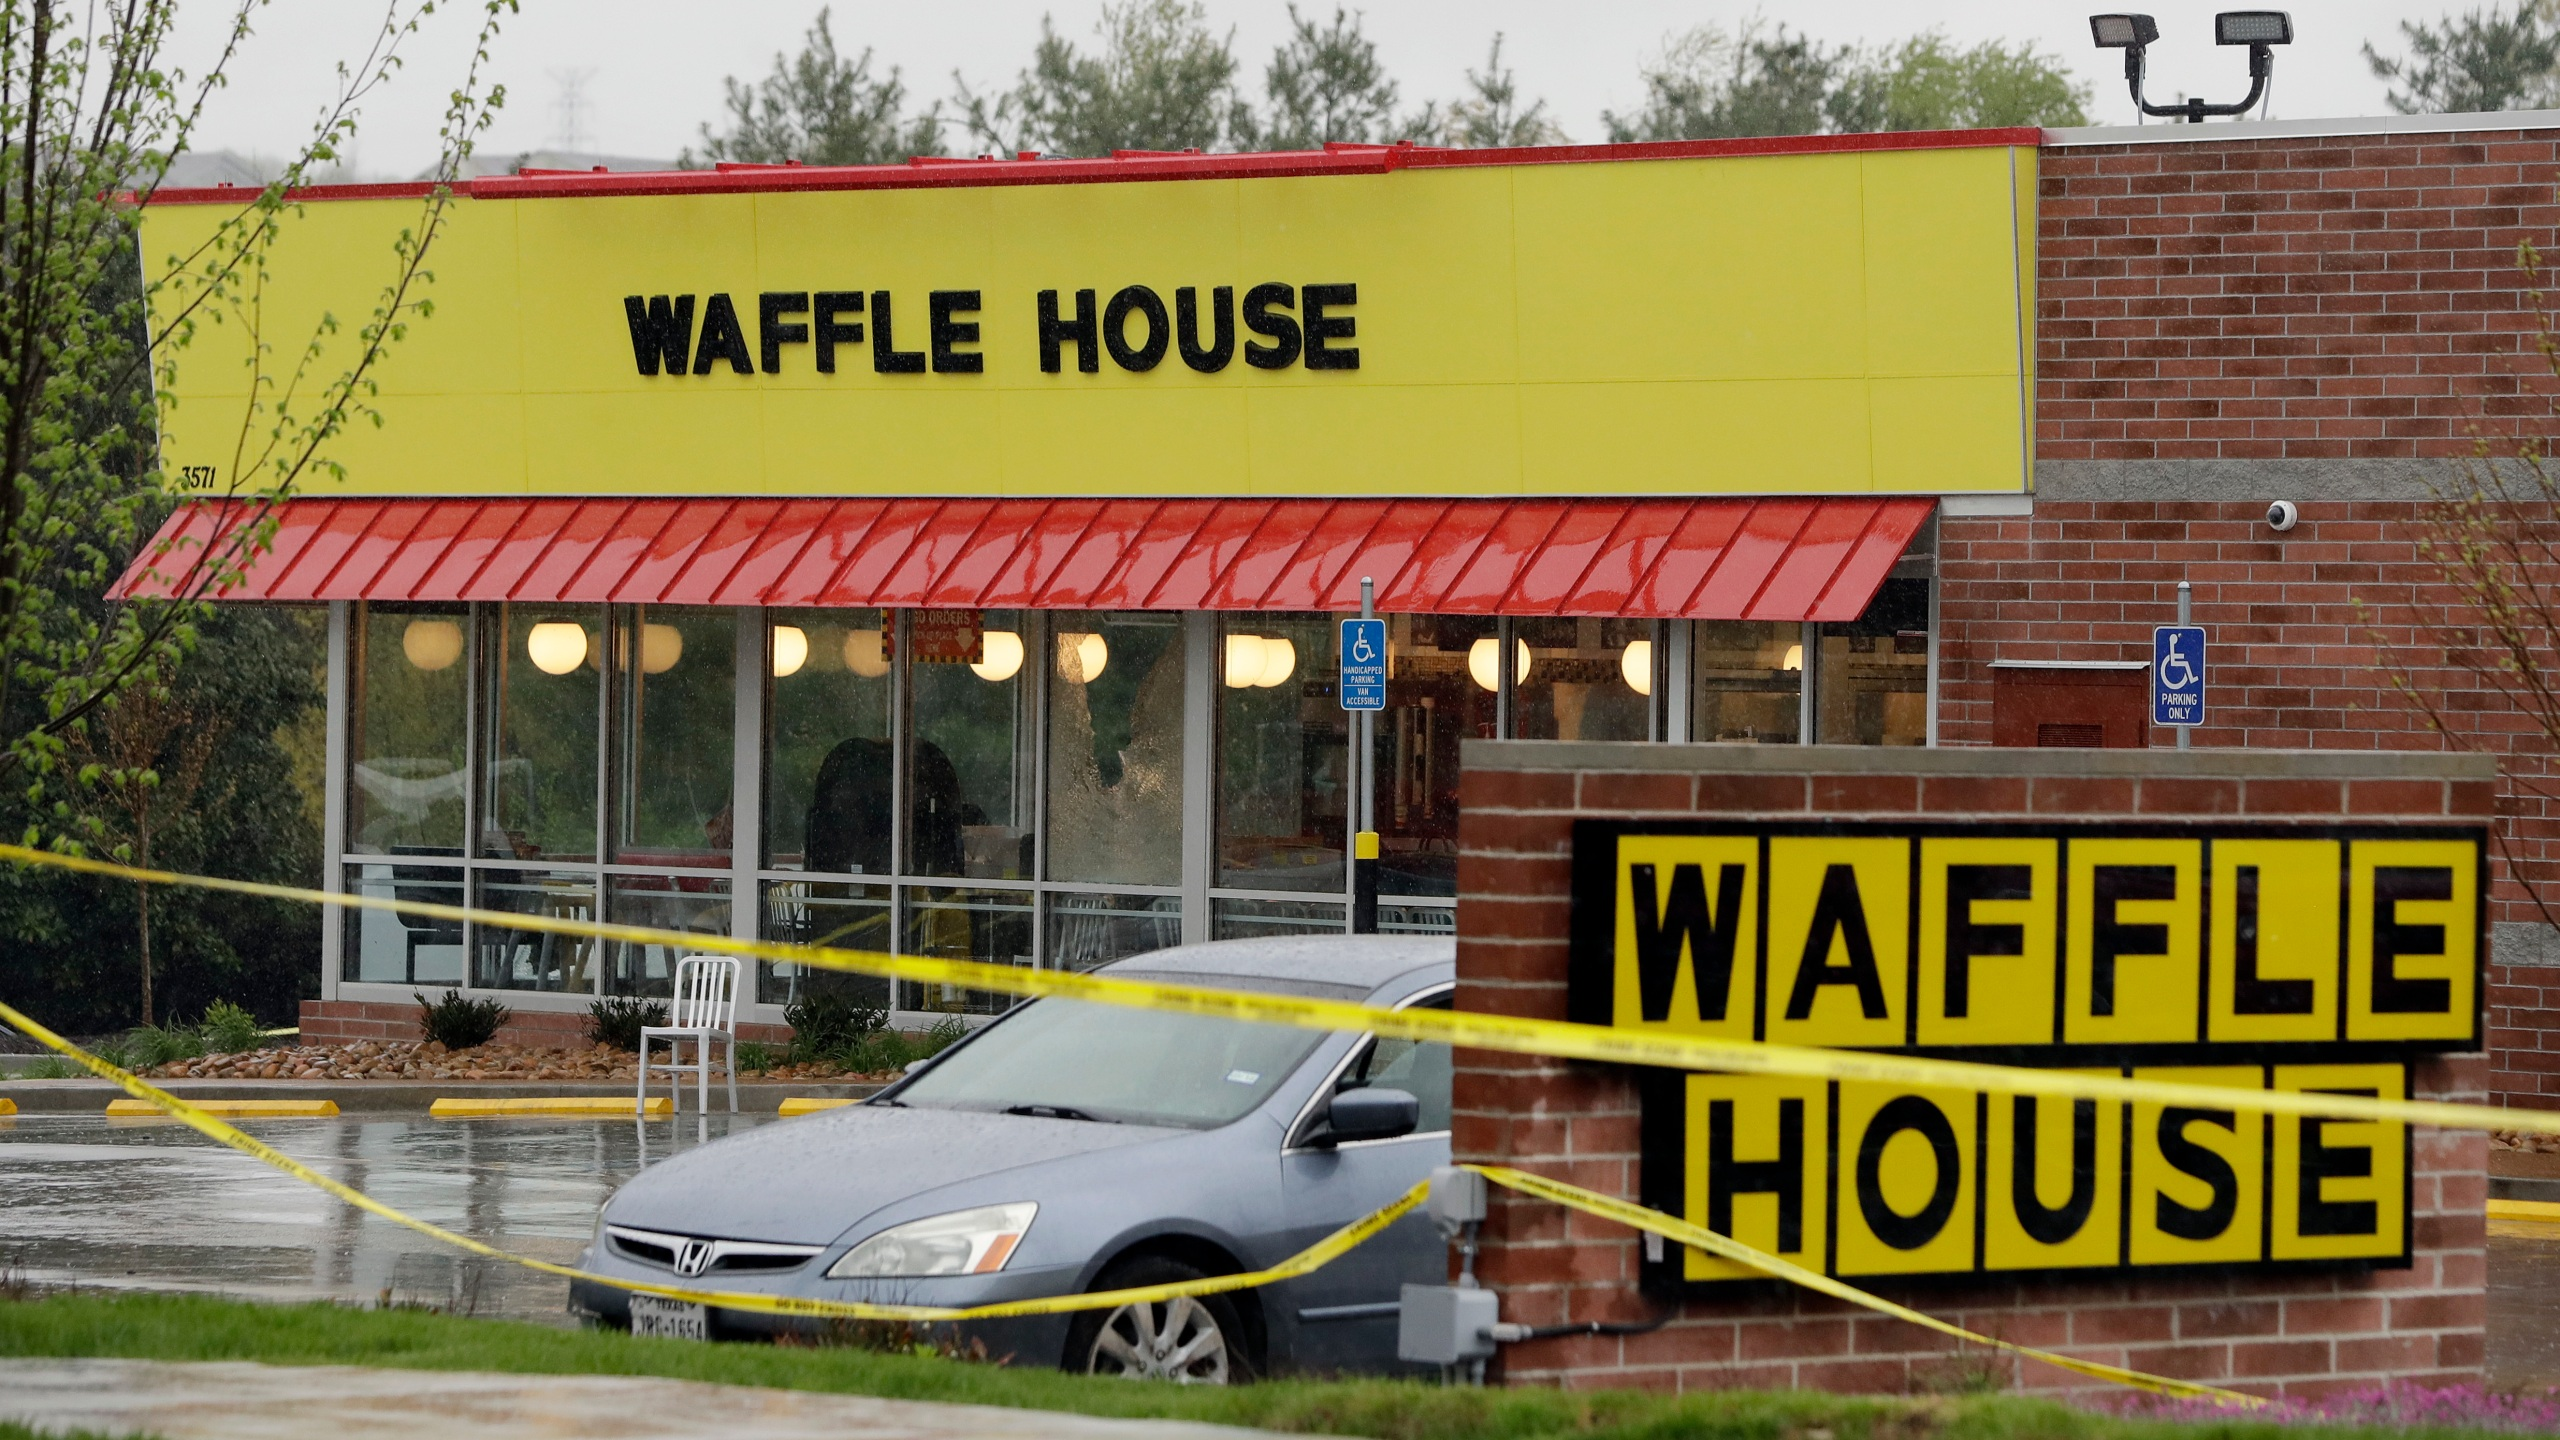 Waffle_House_Shooting_63744-159532.jpg53363007